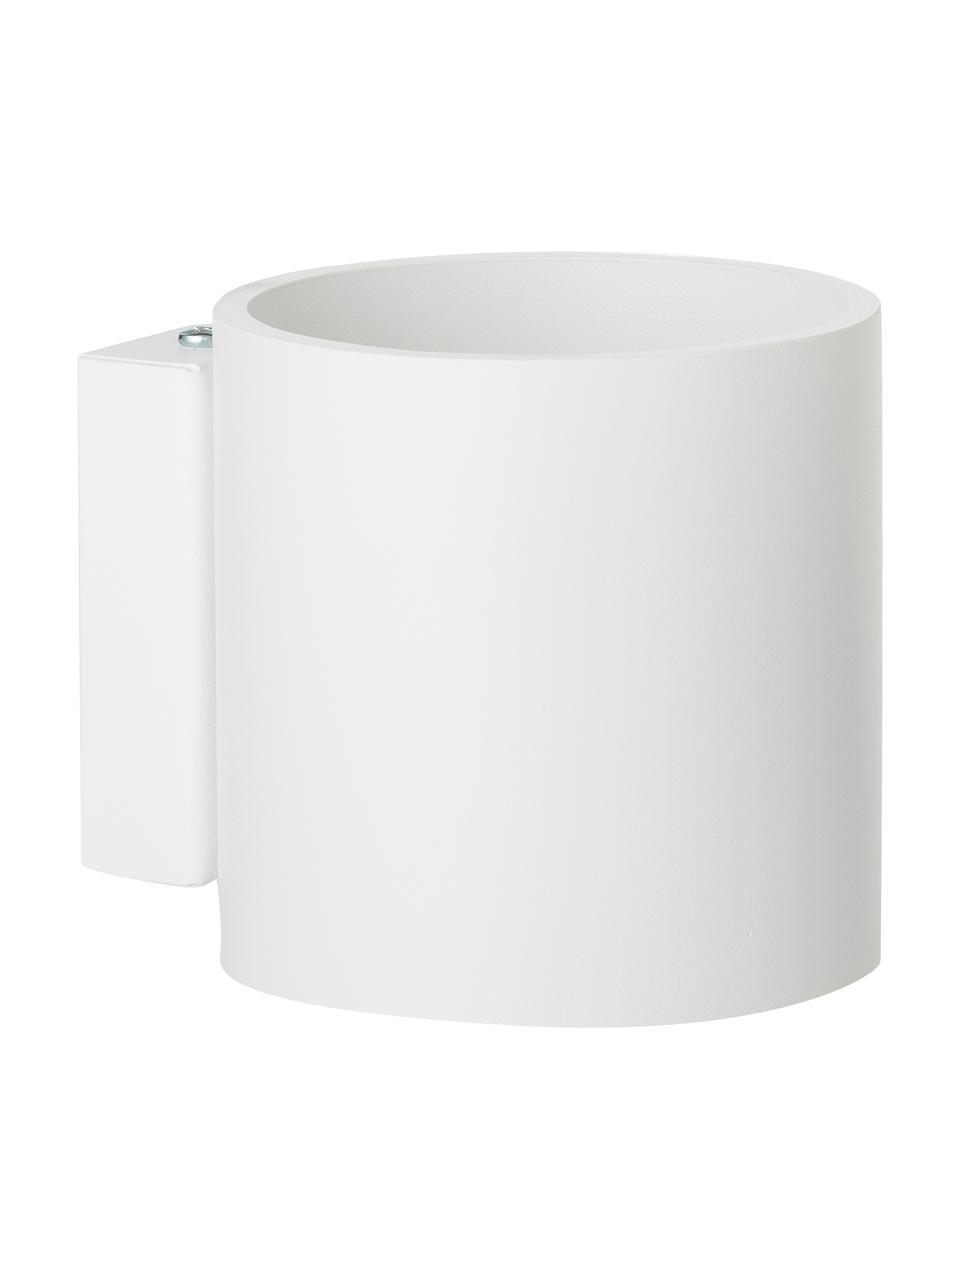 Applique bianca Roda, Paralume: alluminio verniciato a po, Bianco, Larg. 10 x Alt. 10 cm